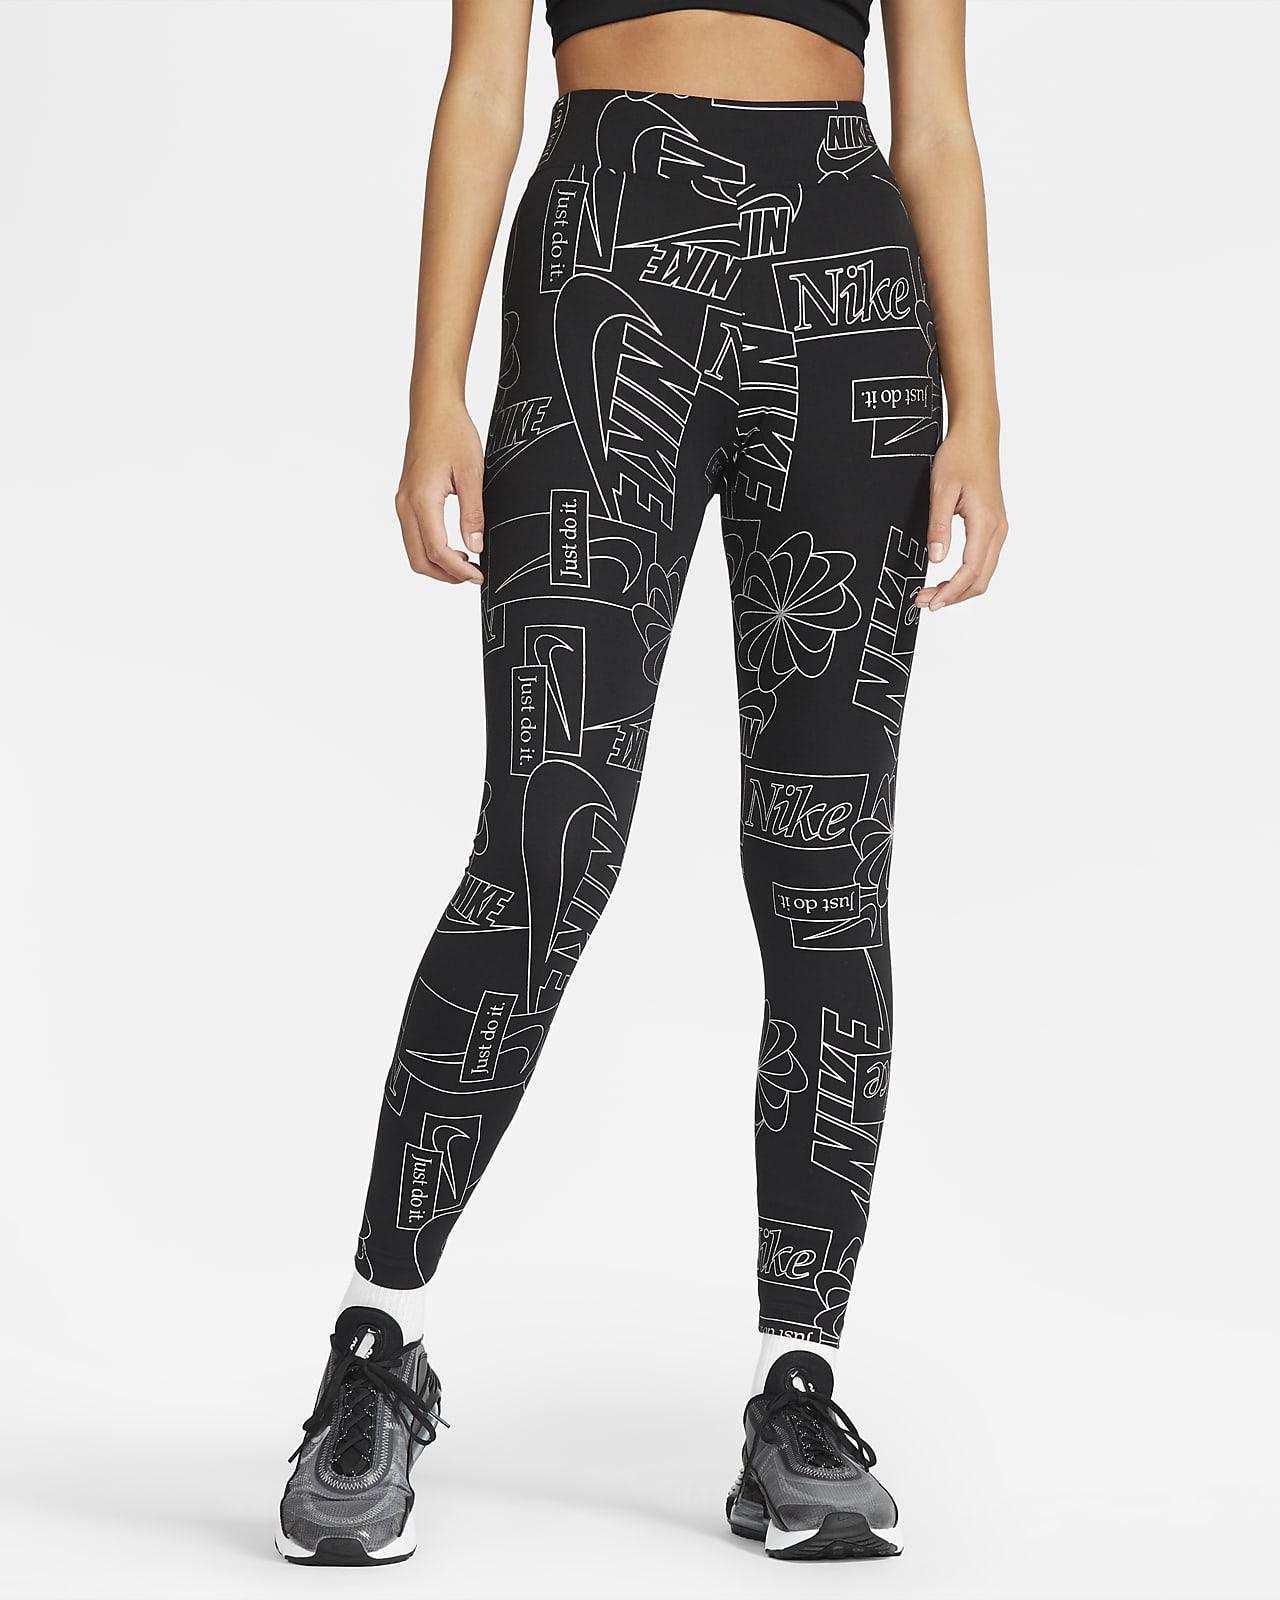 Nike Sportswear Icon Clash 女子高腰紧身裤